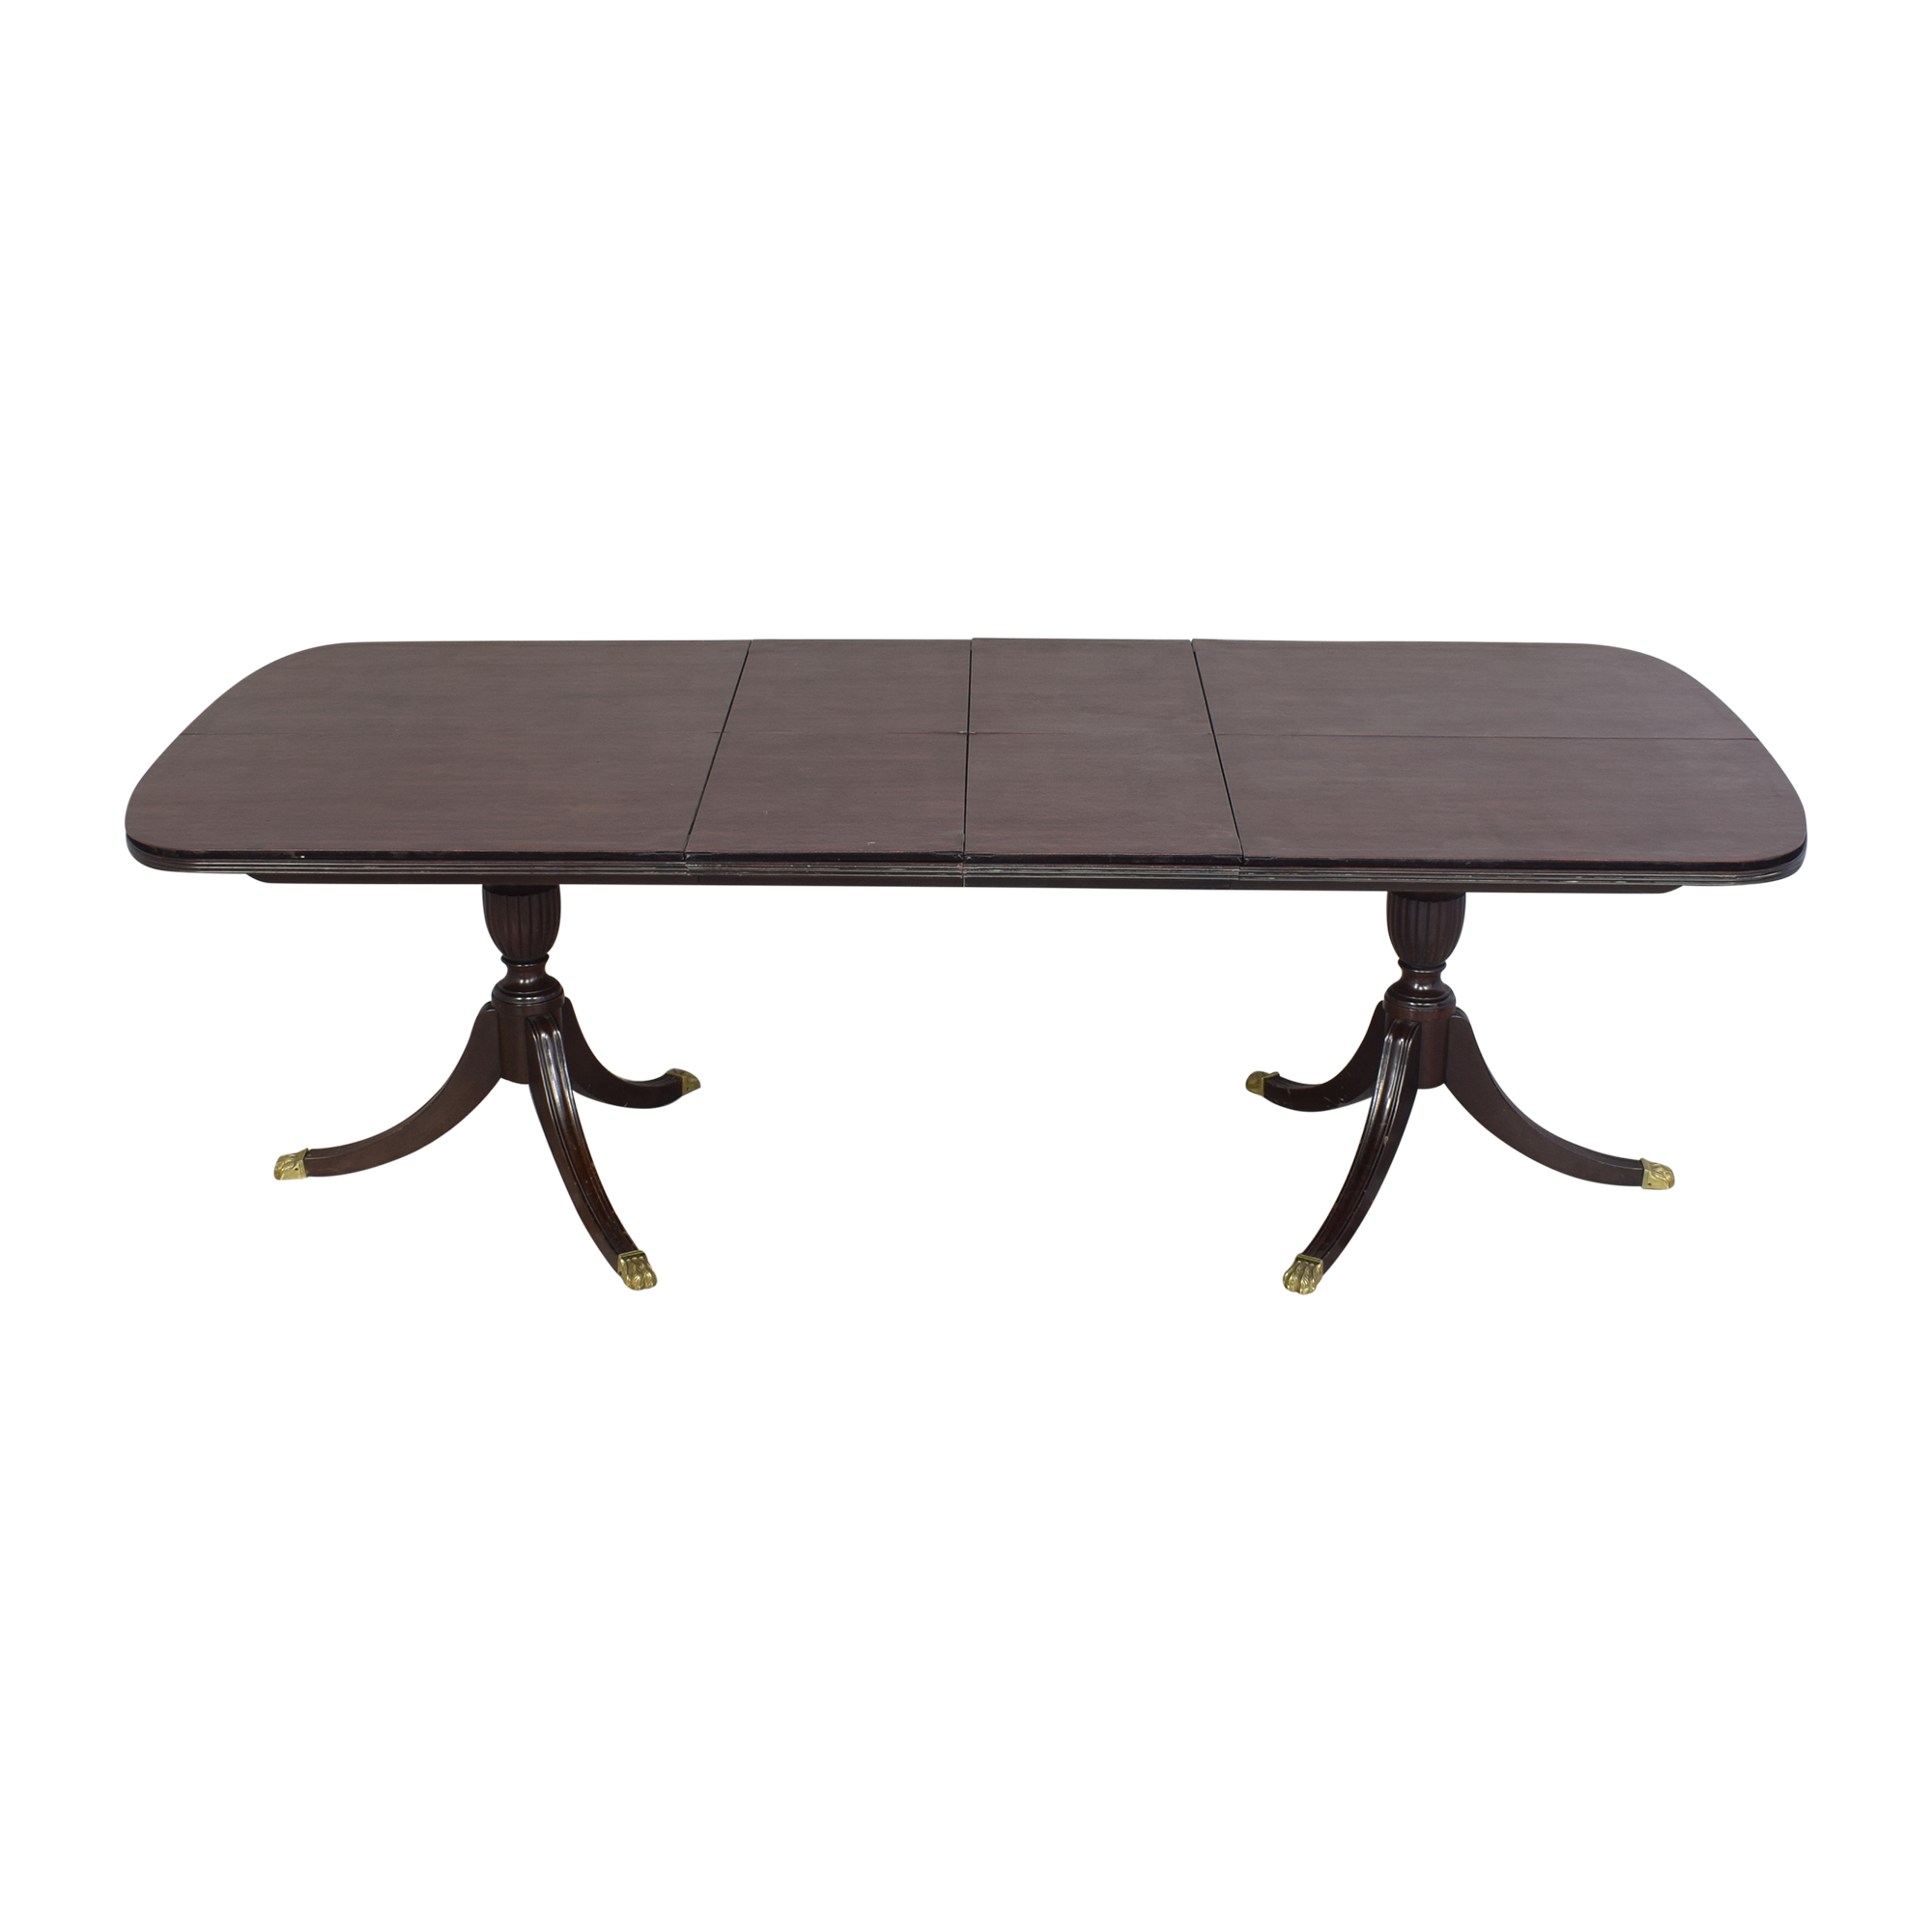 shop Stickley Furniture Stickley Furniture Extendable Double Pedestal Dining Table online